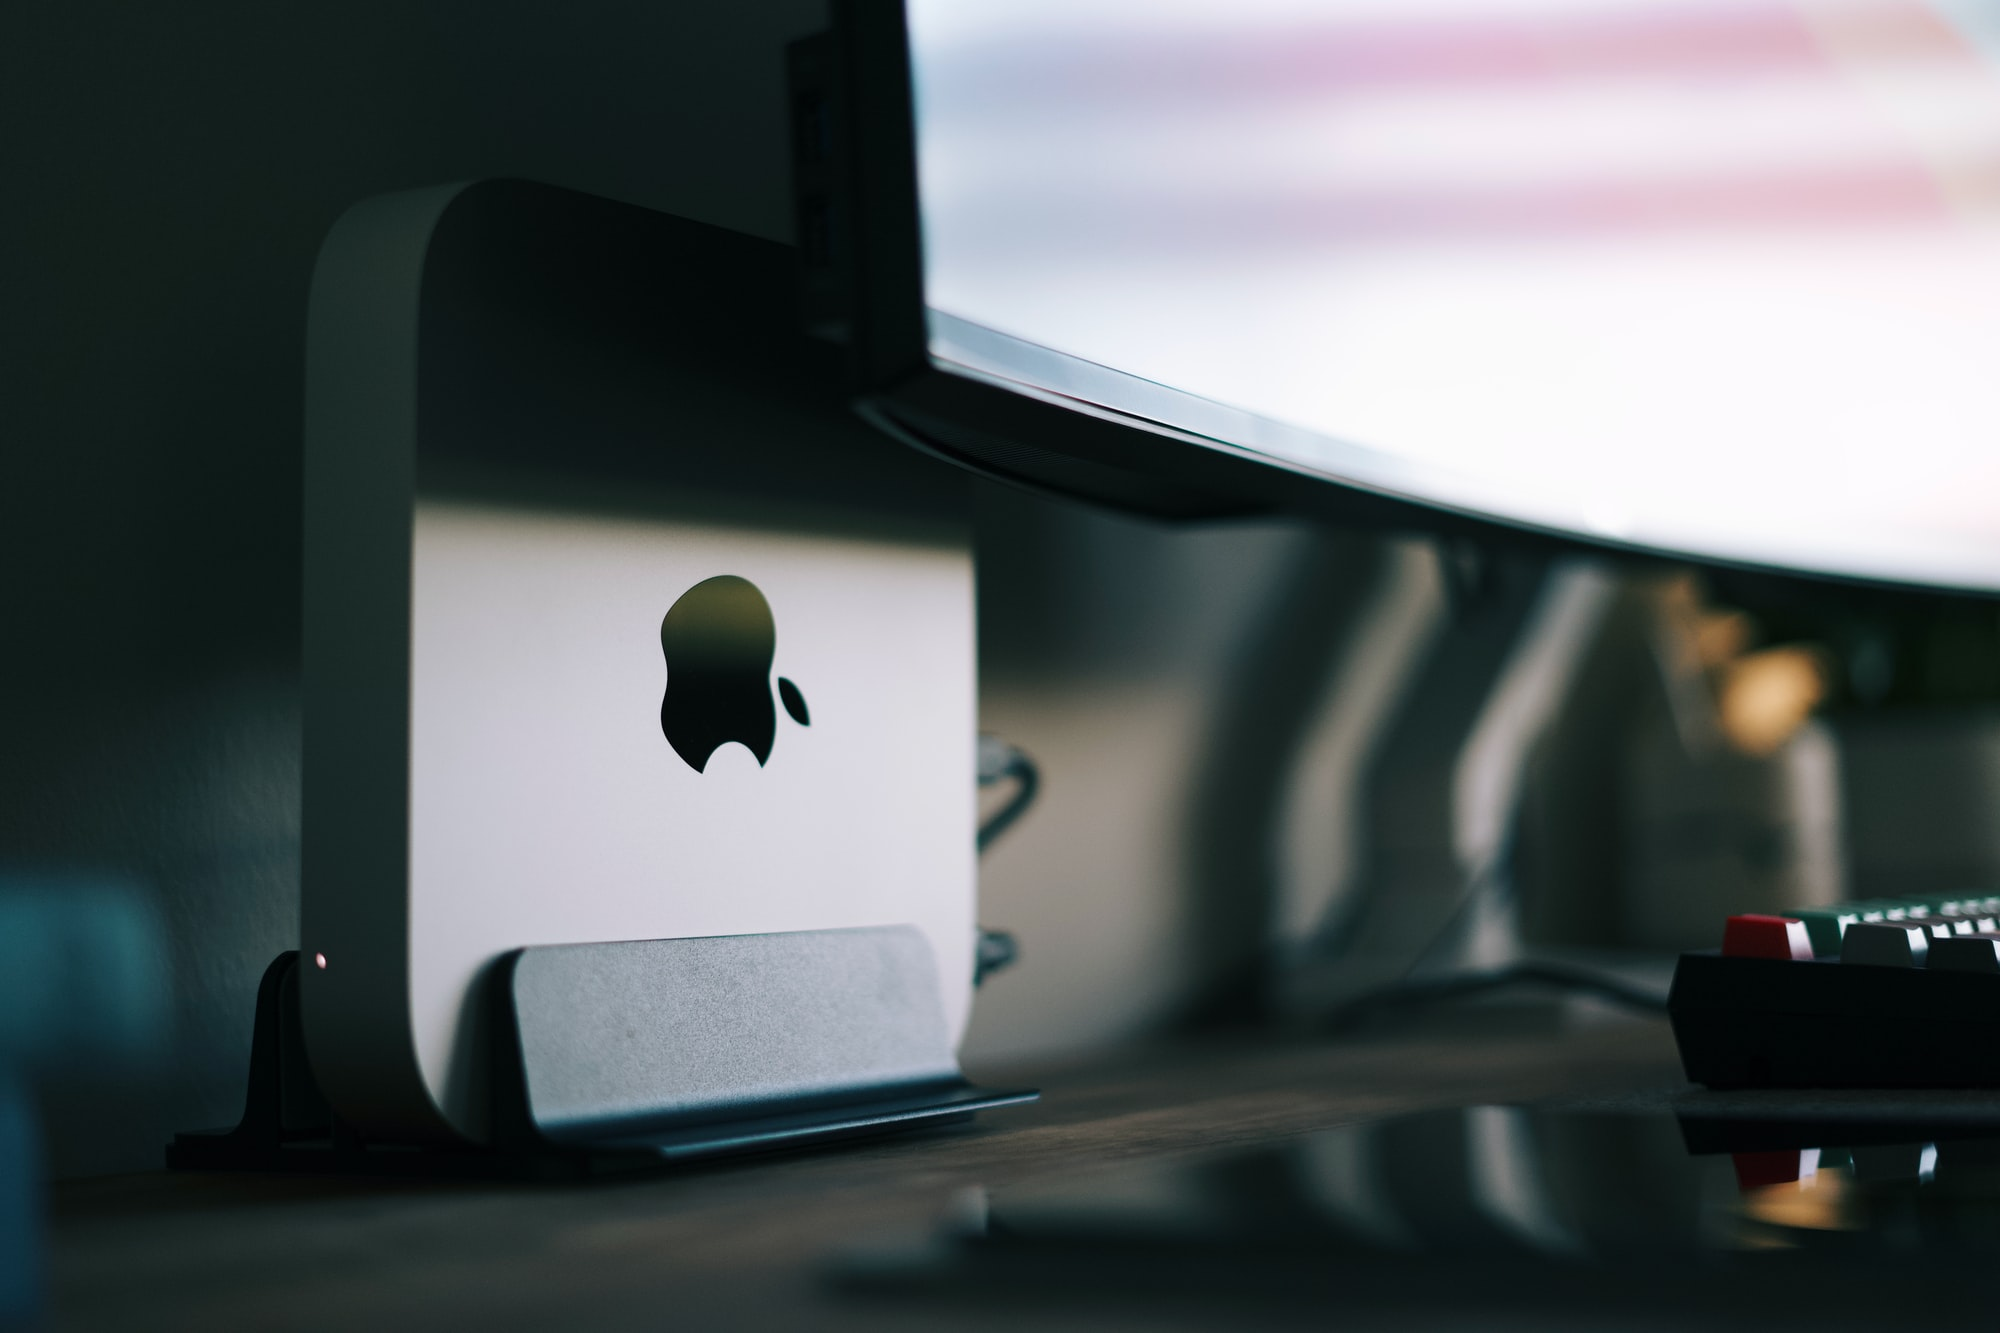 Mac mini com Apple Silicon versus Mac mini com Intel